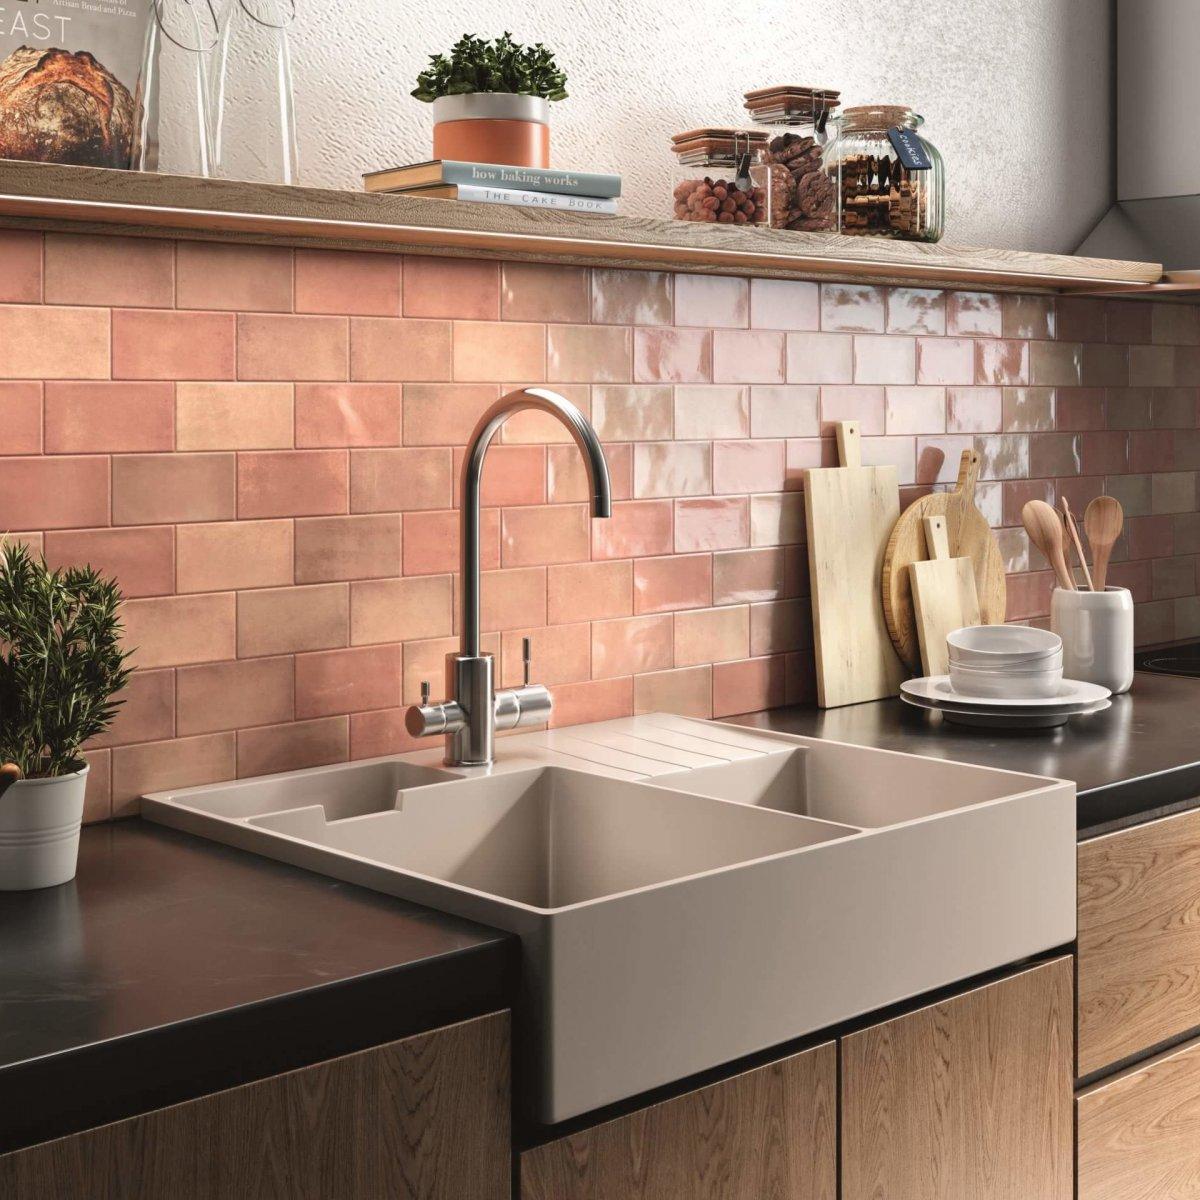 Ceramica Ribesalbes Earth Rosebud Gloss 75x300mm_Stiles_Lifestyle_Image